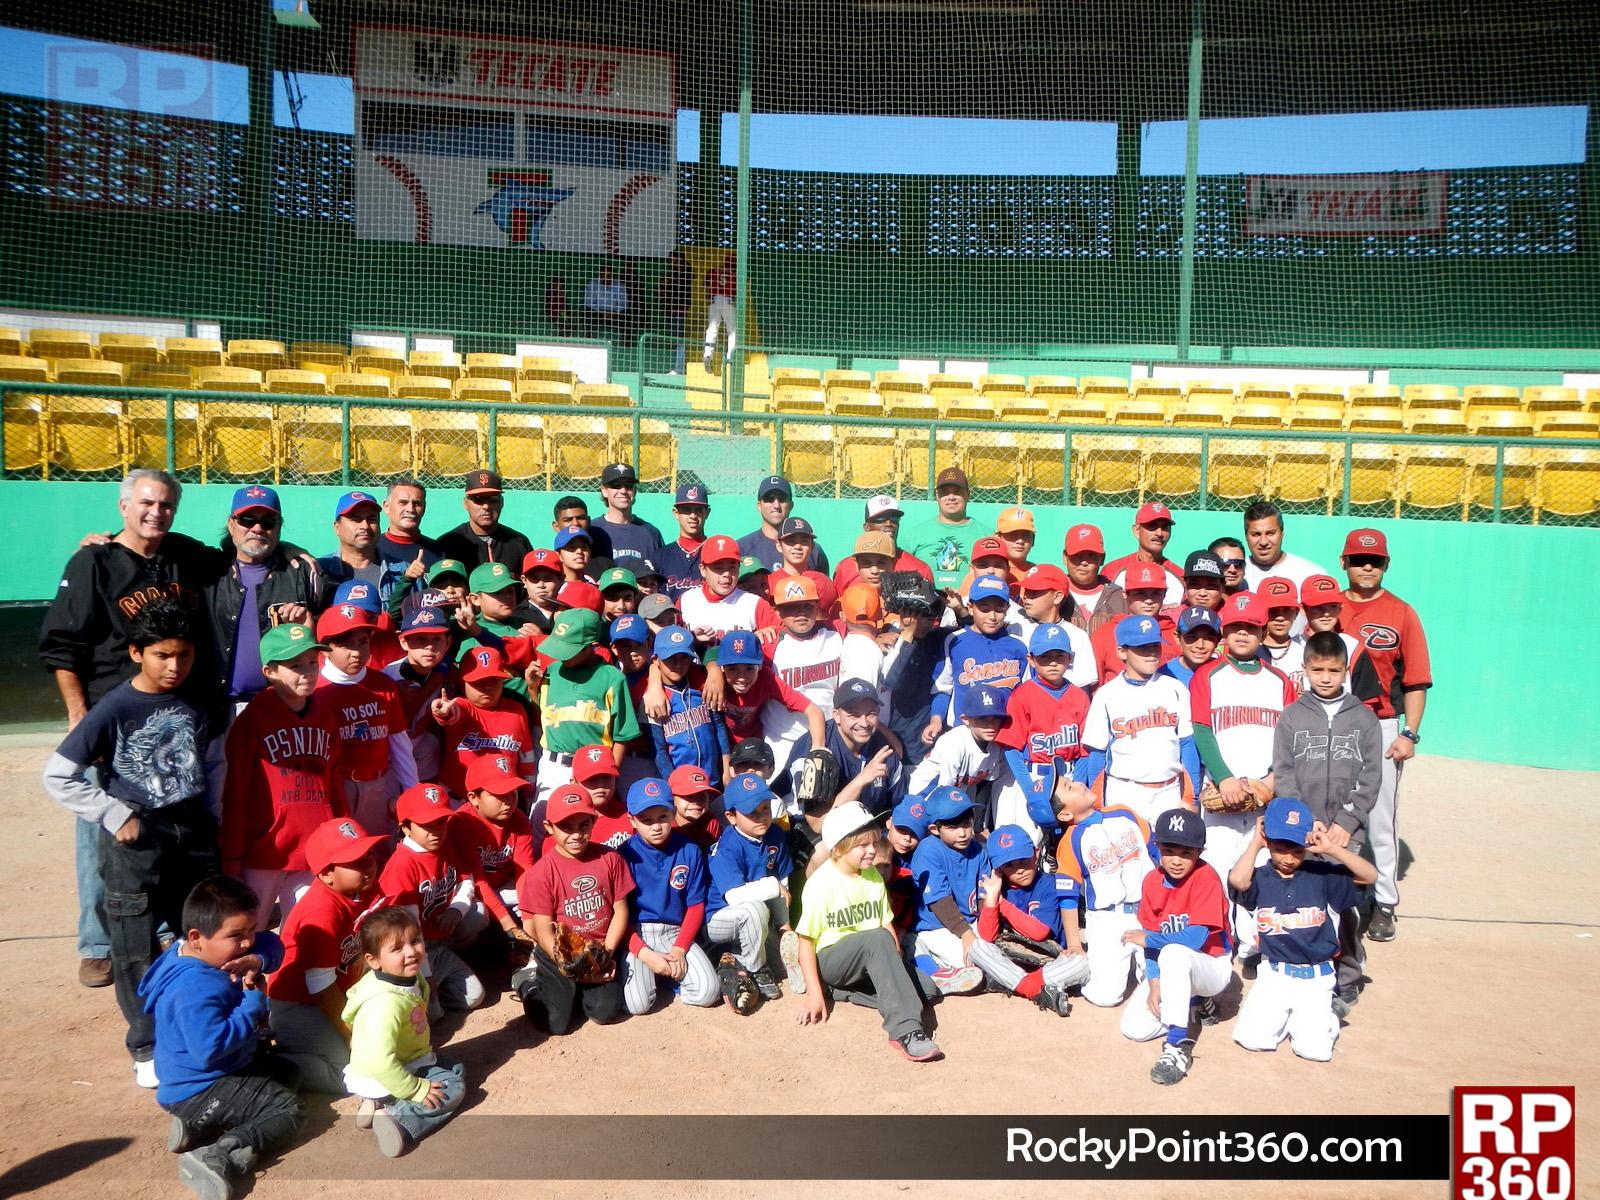 8th Annual Major League Coaches Clinic - Youth Sports